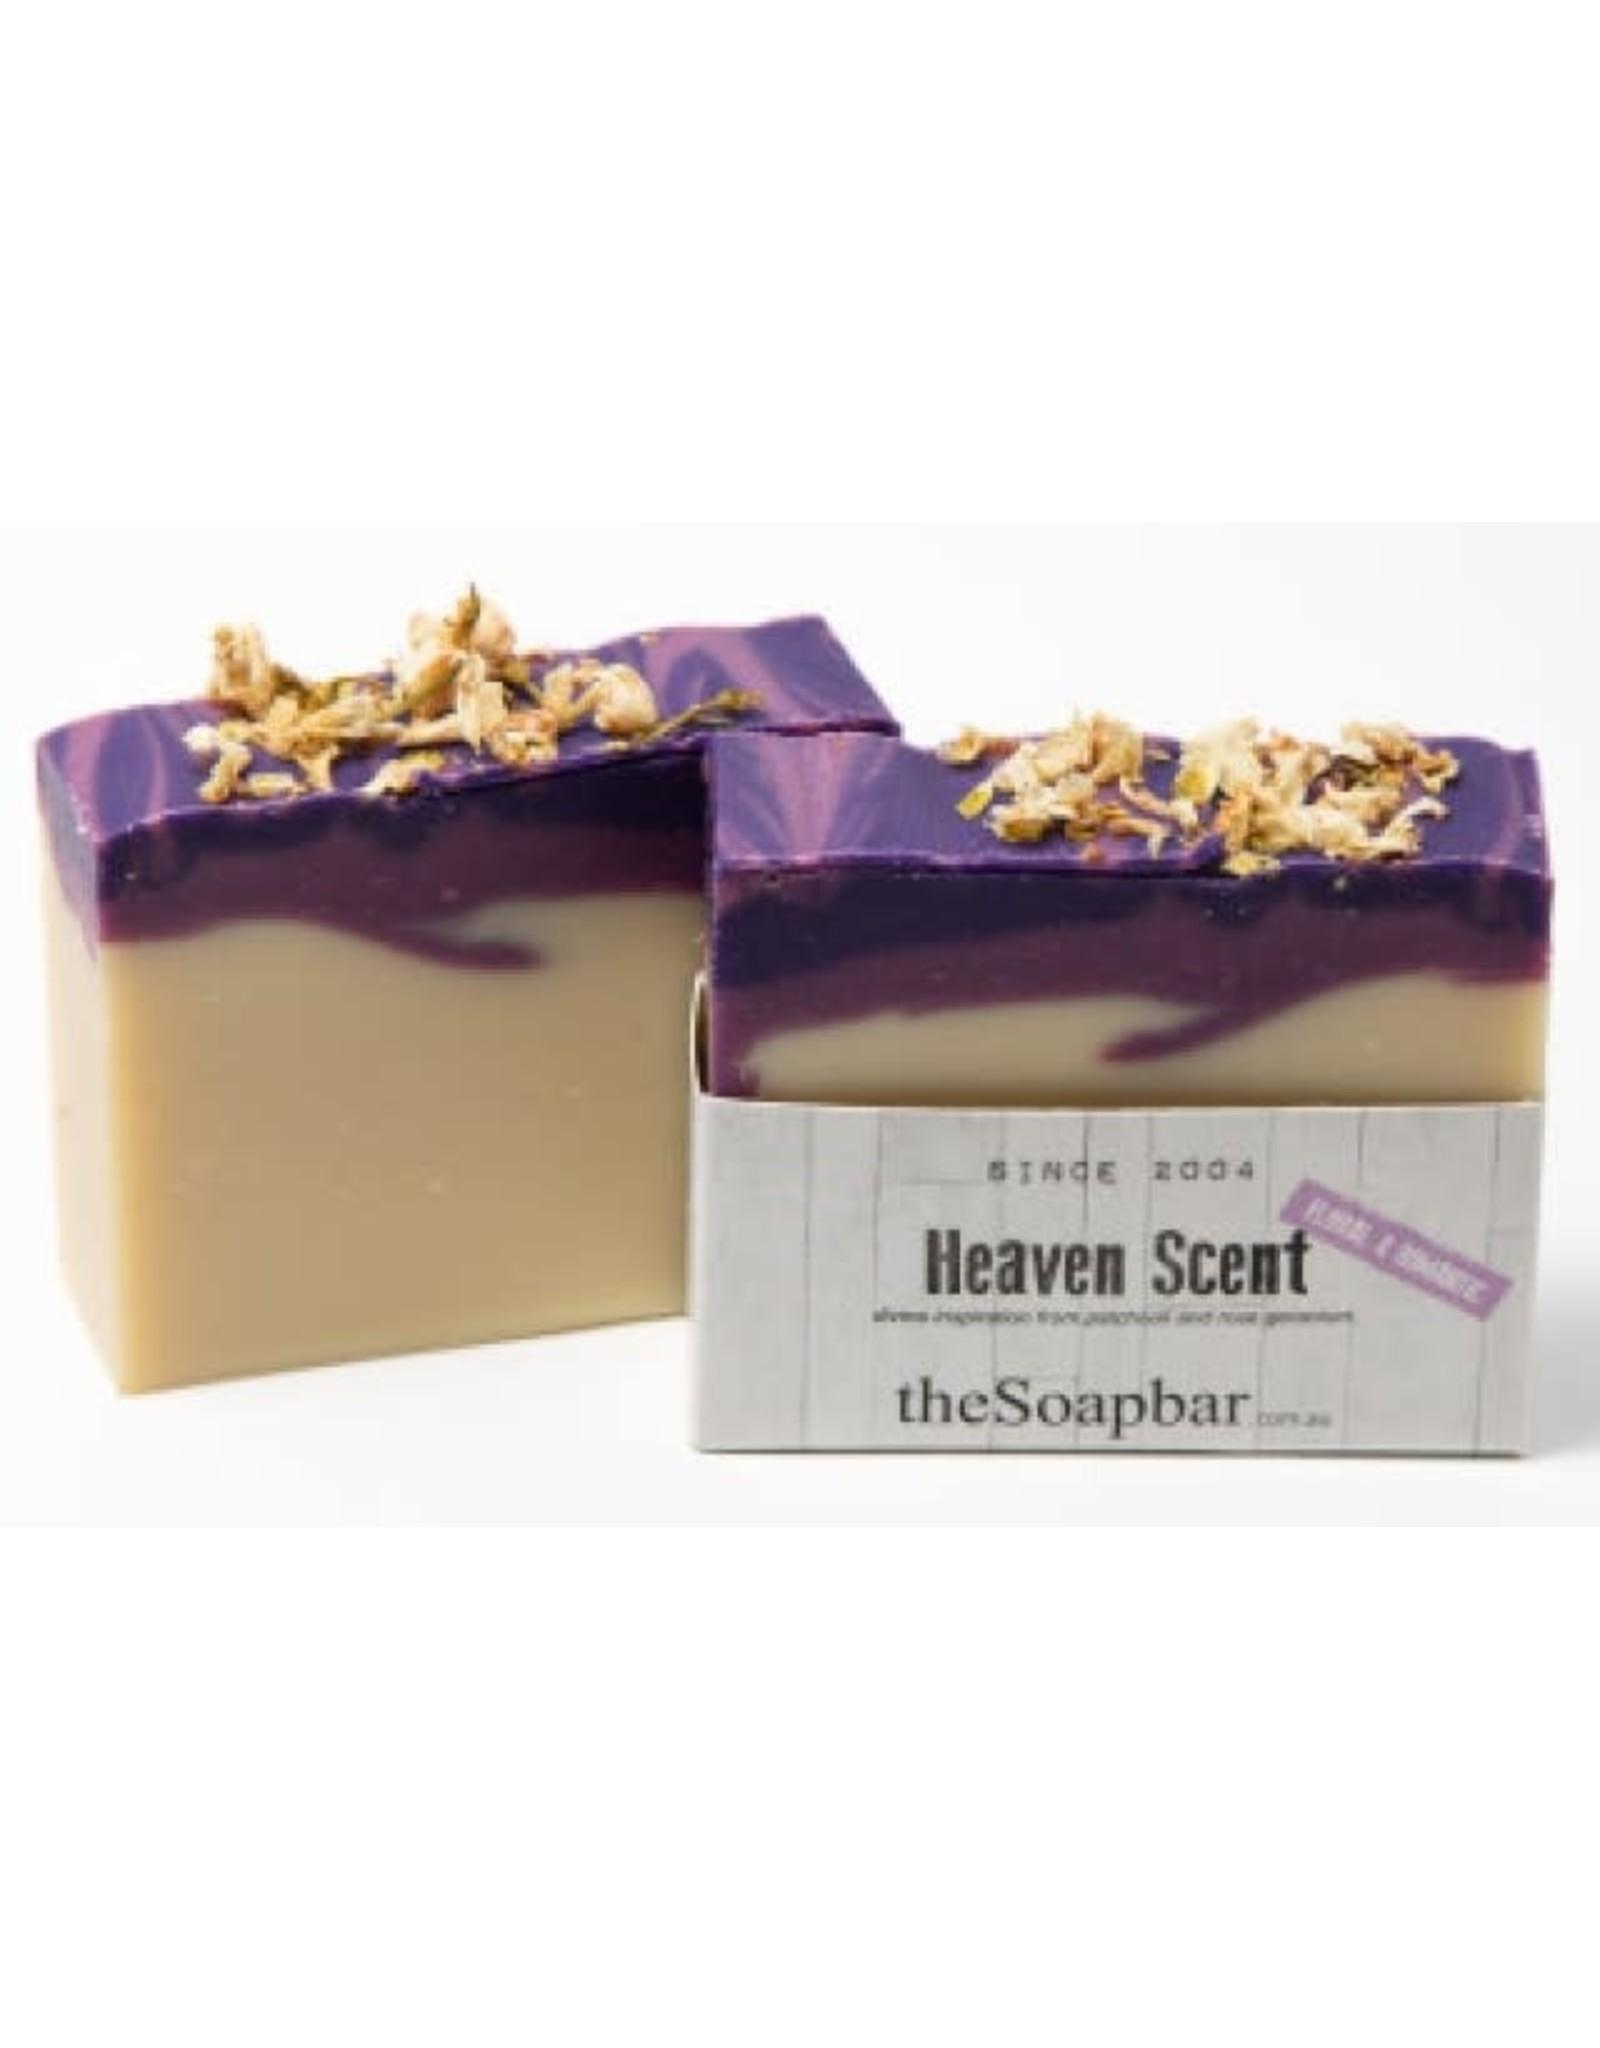 The Soap Bar Heaven Scent Soap